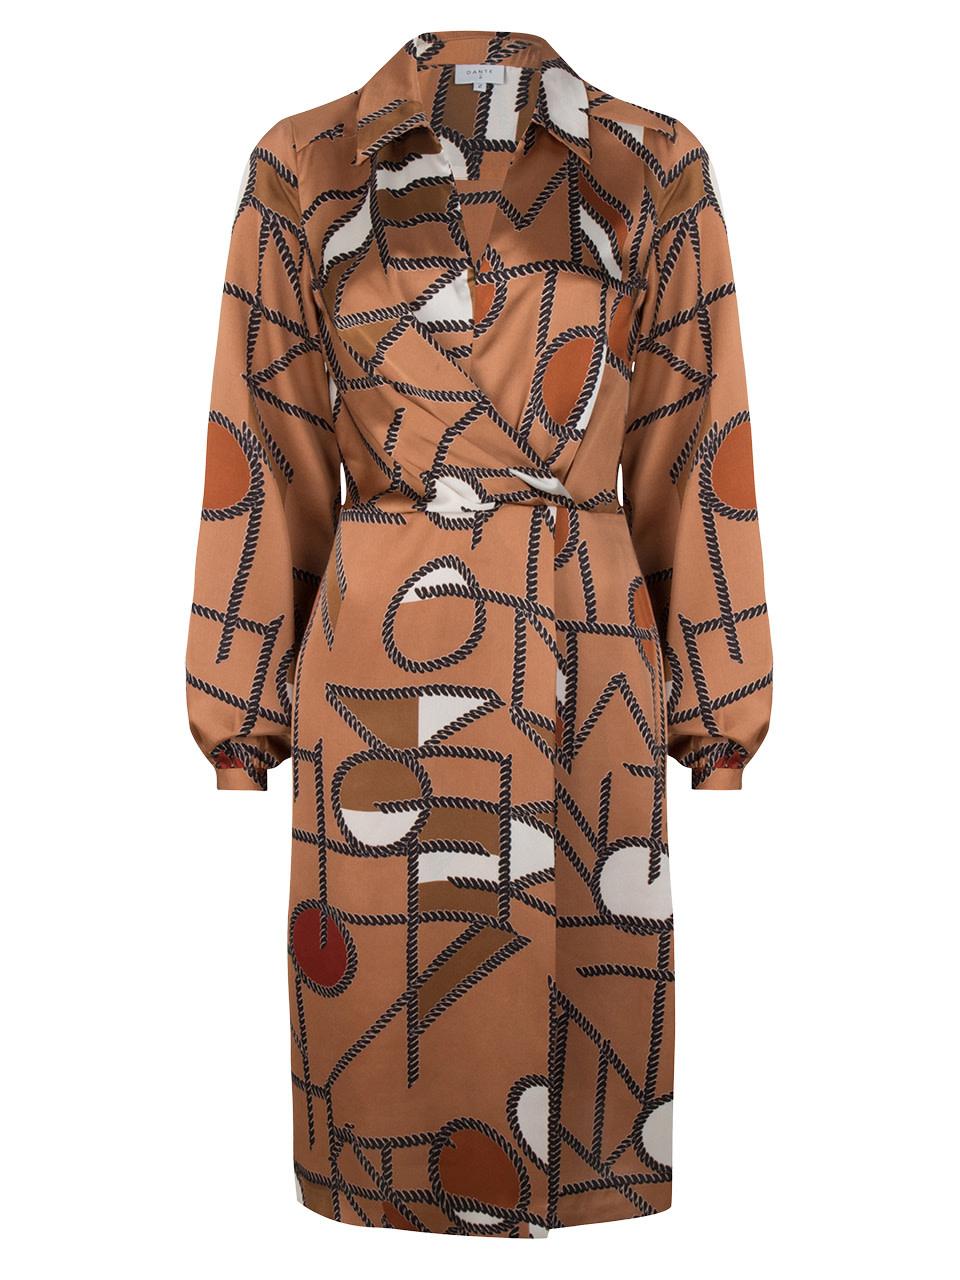 Madison chain print dress long-3